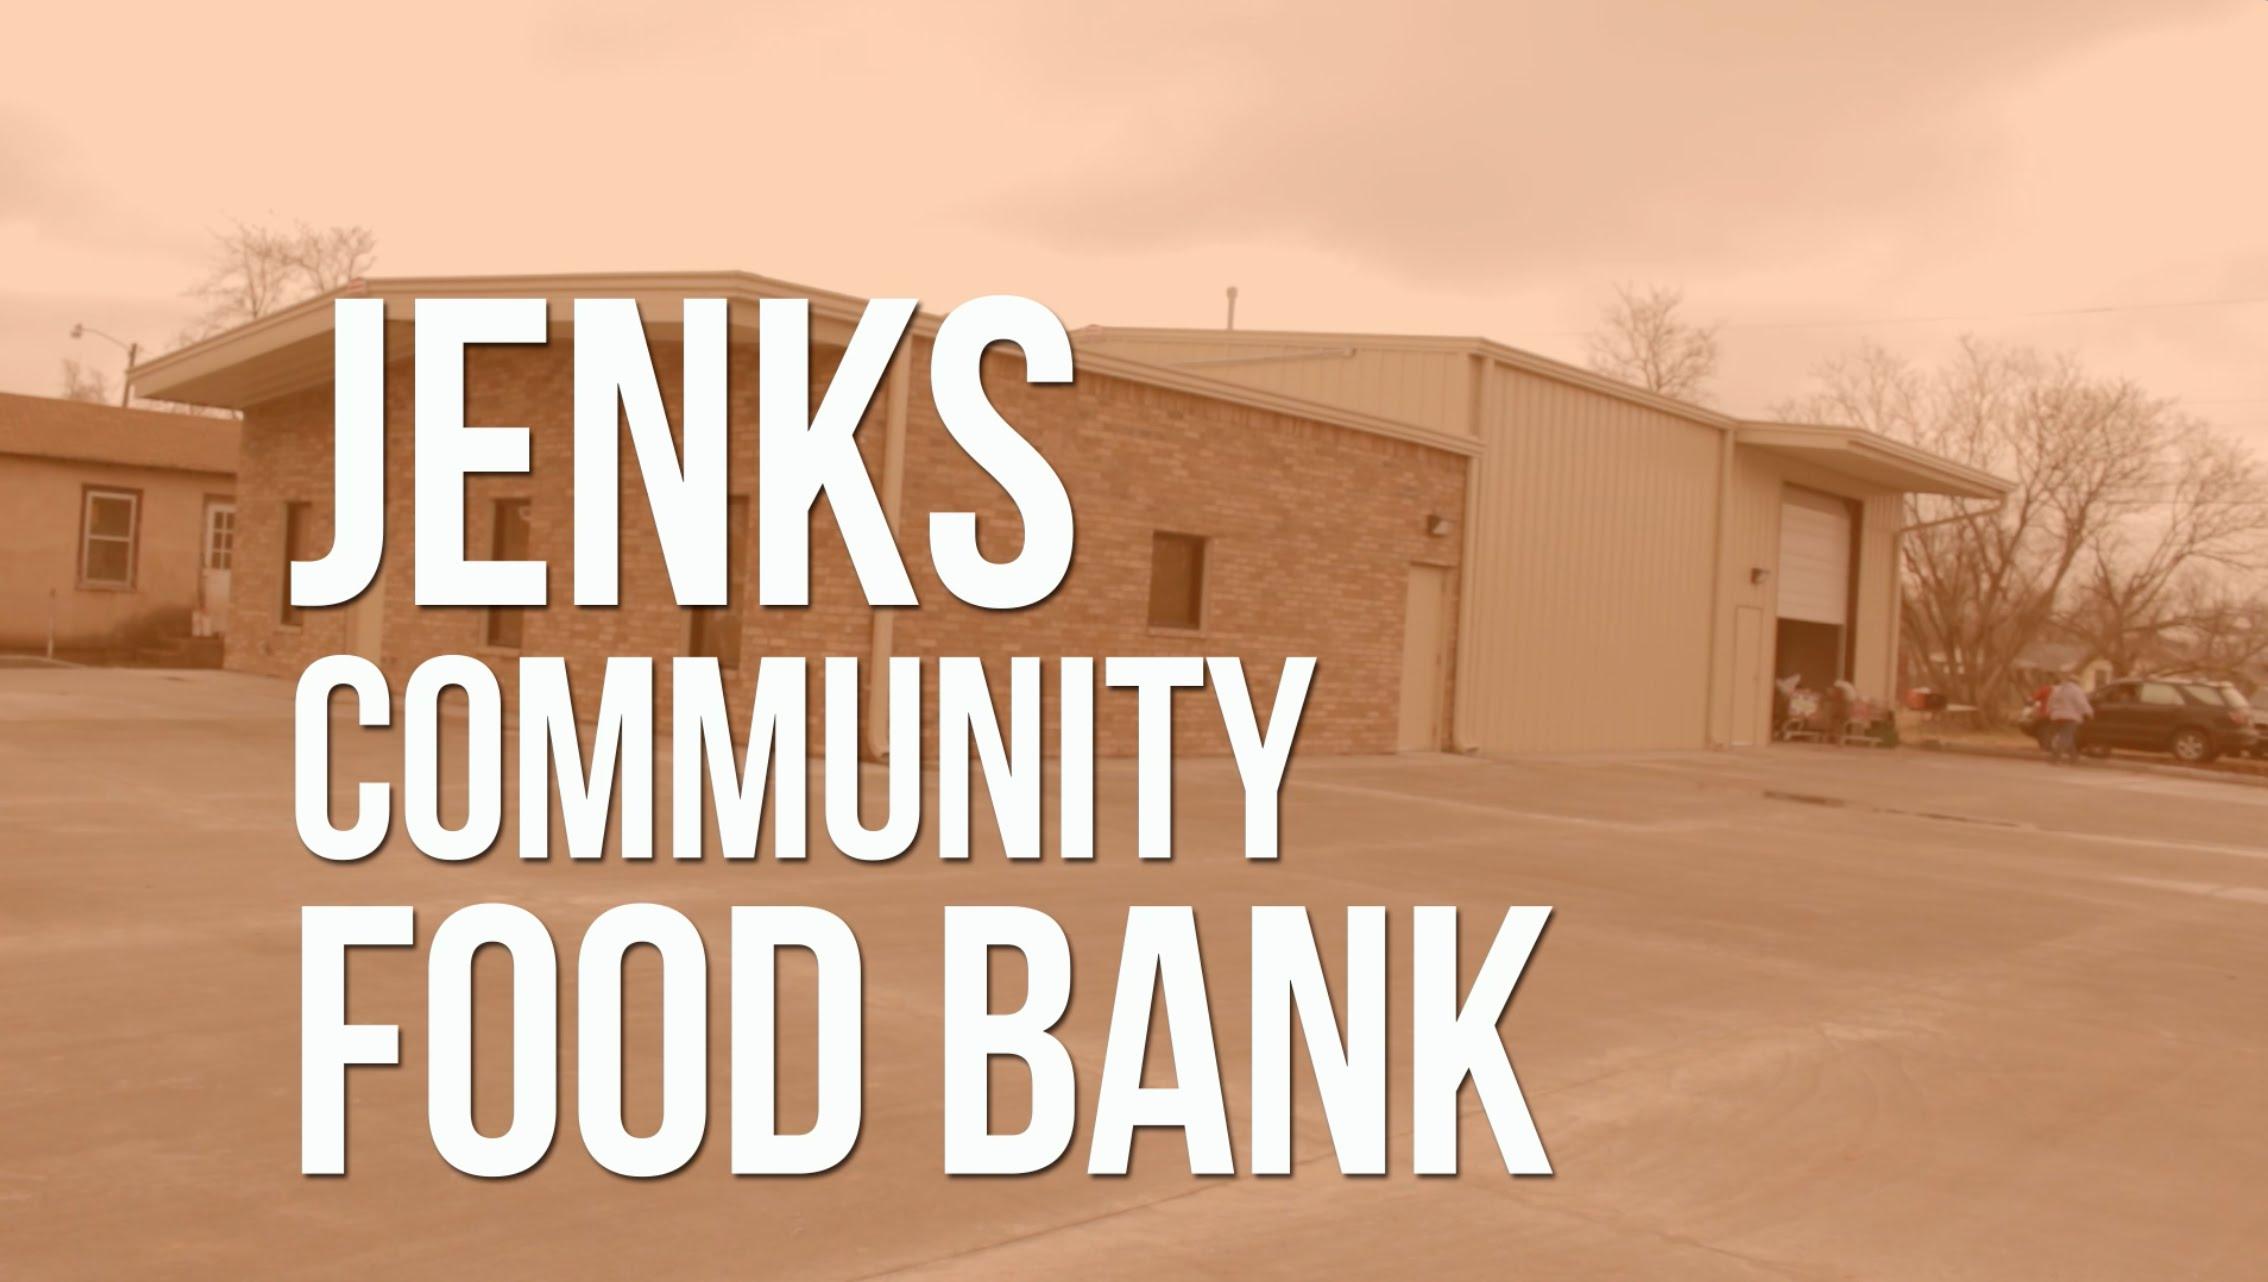 Jenks Community Food Bank